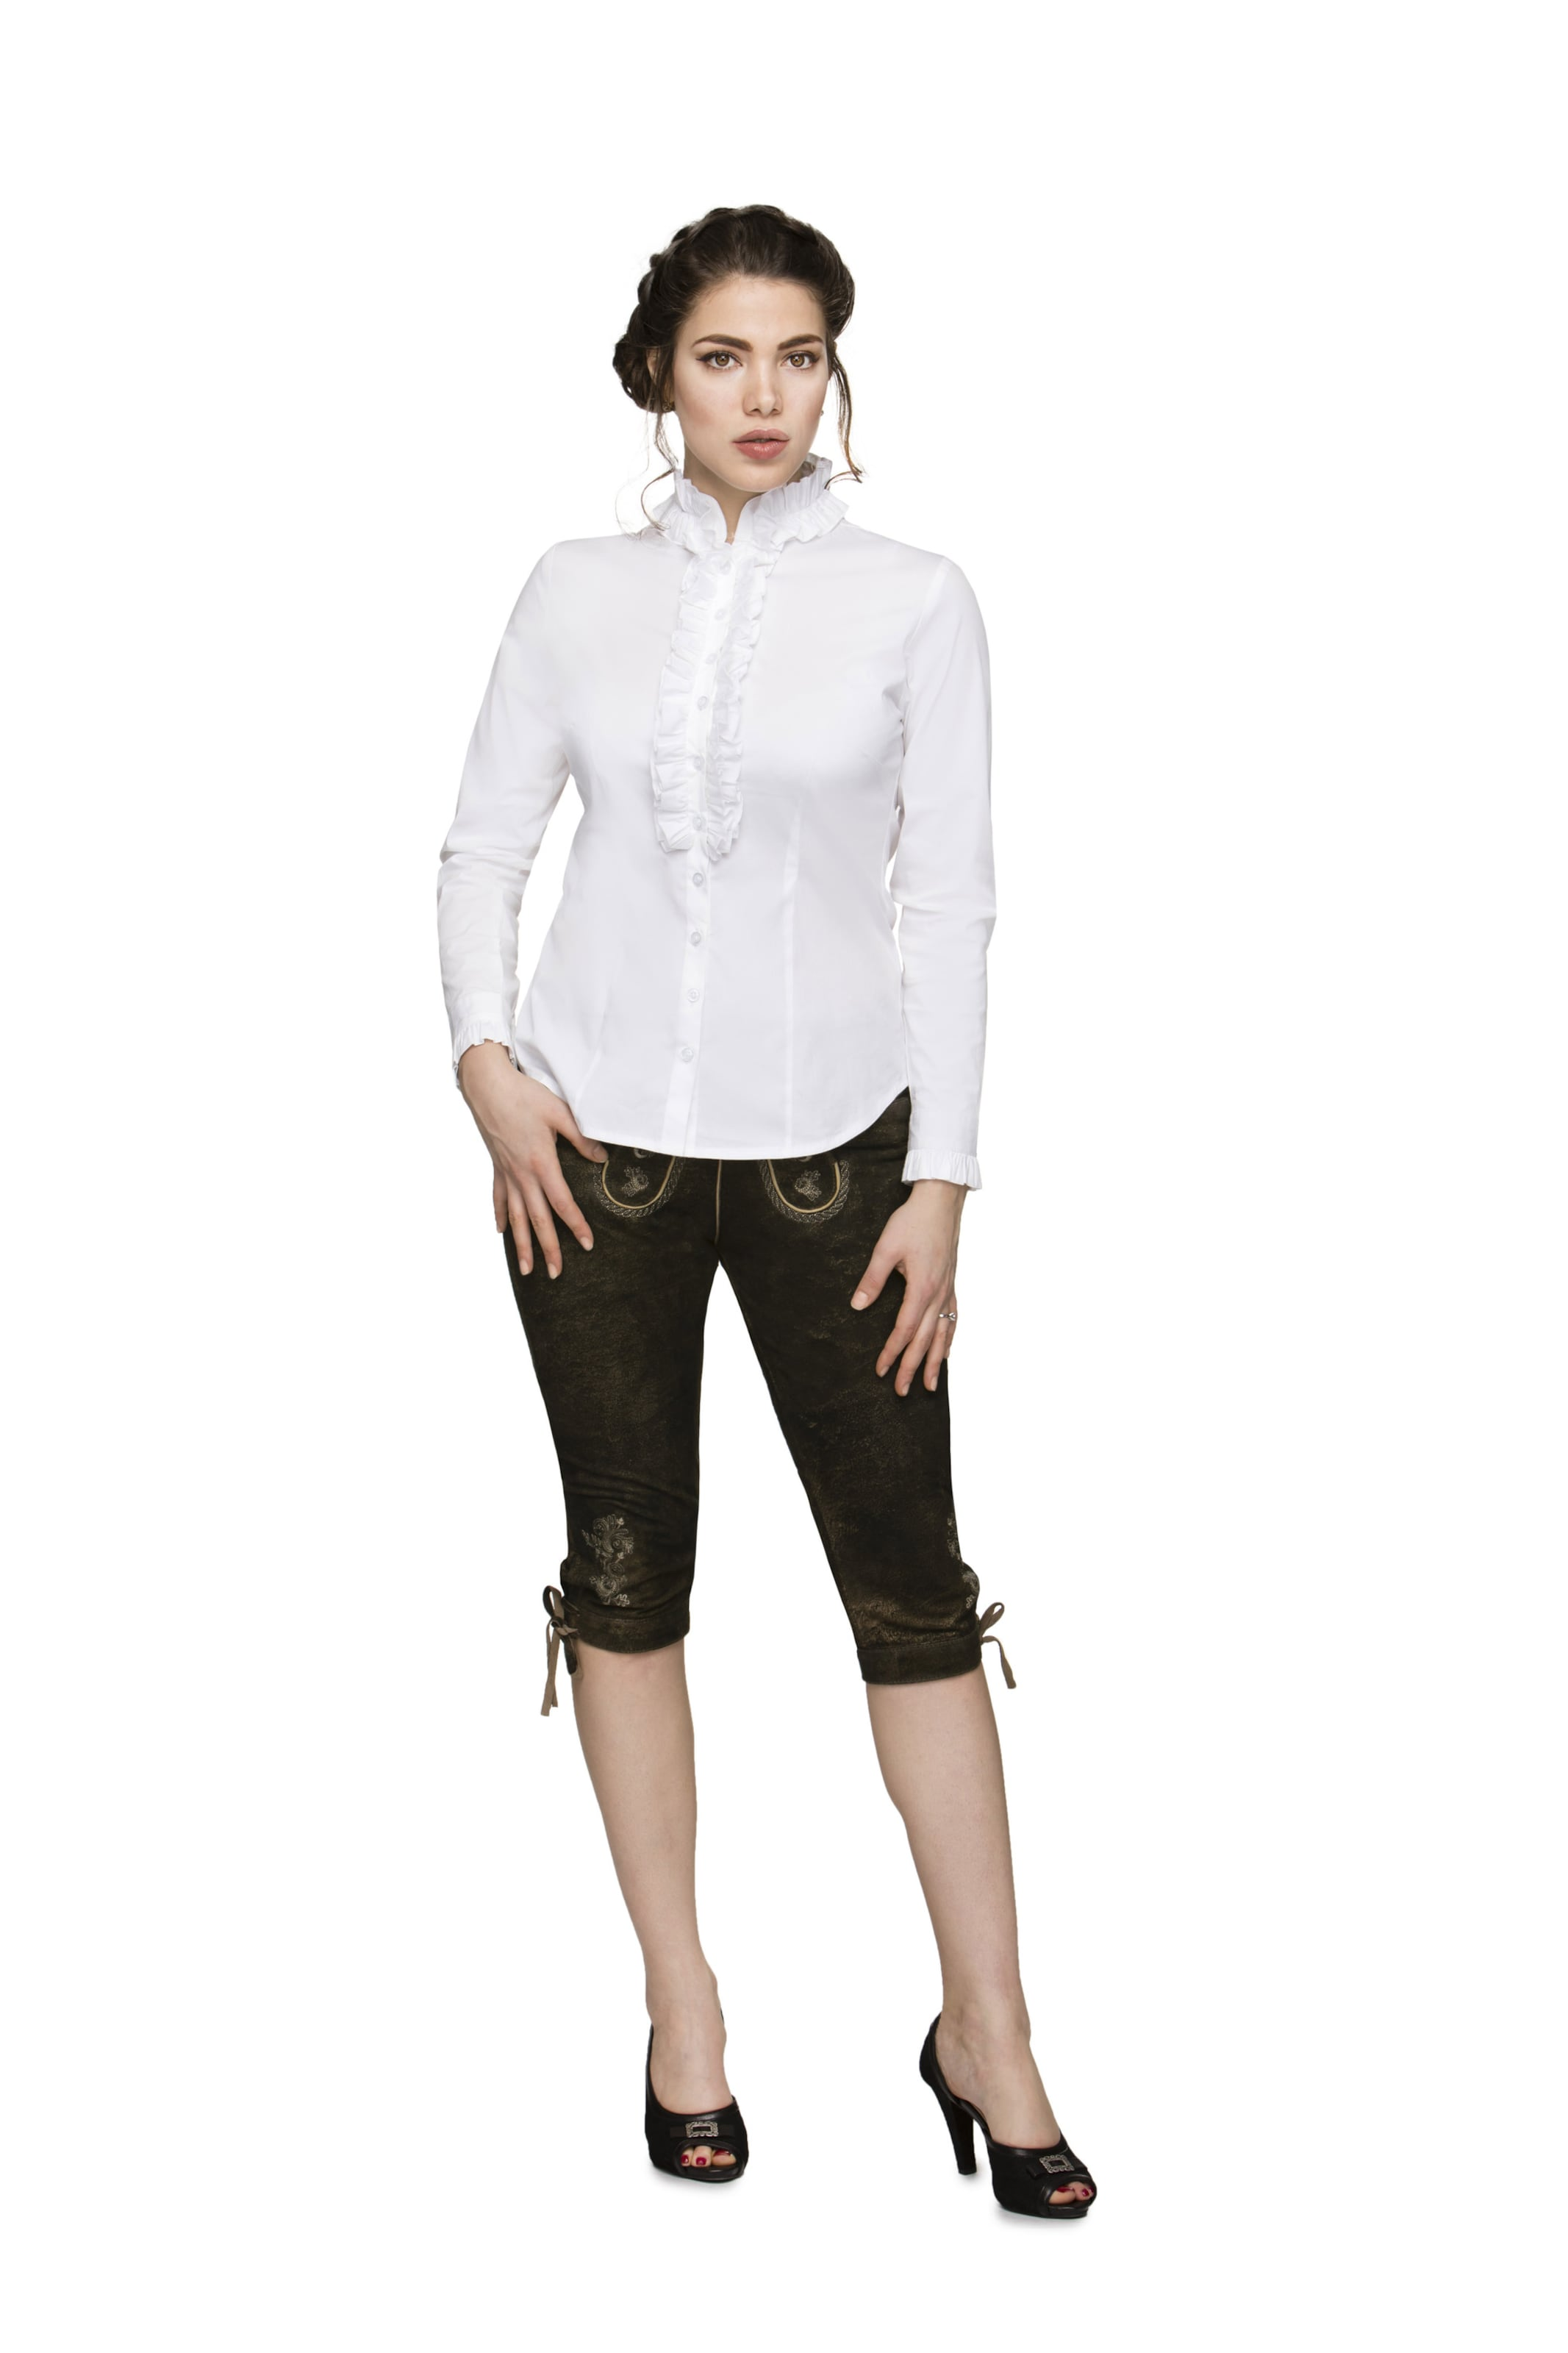 Bluse In Weiß 'emilia' Stockerpoint 80OPXwnk